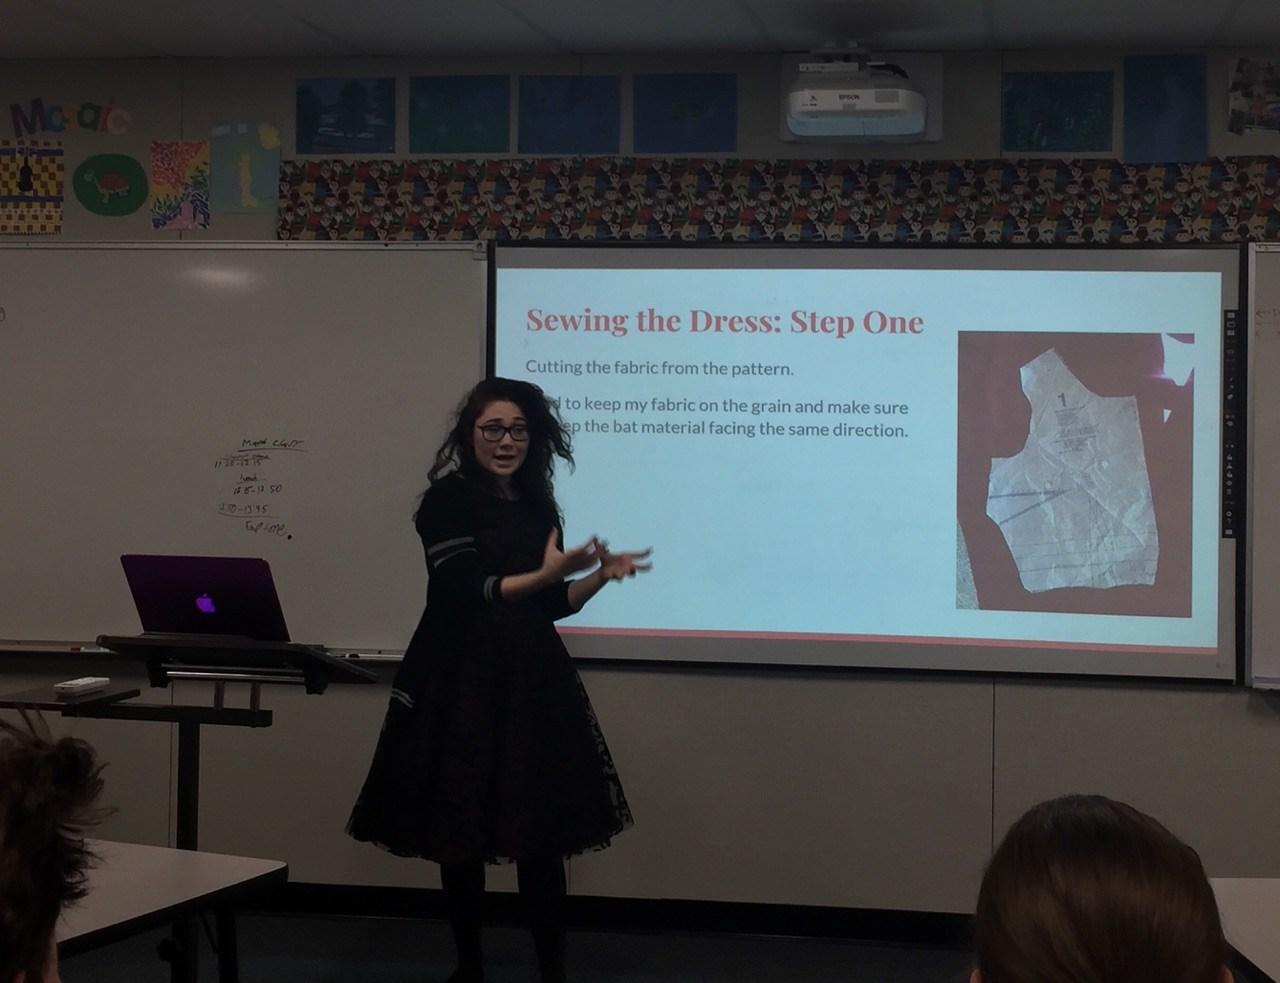 Student doing presentation